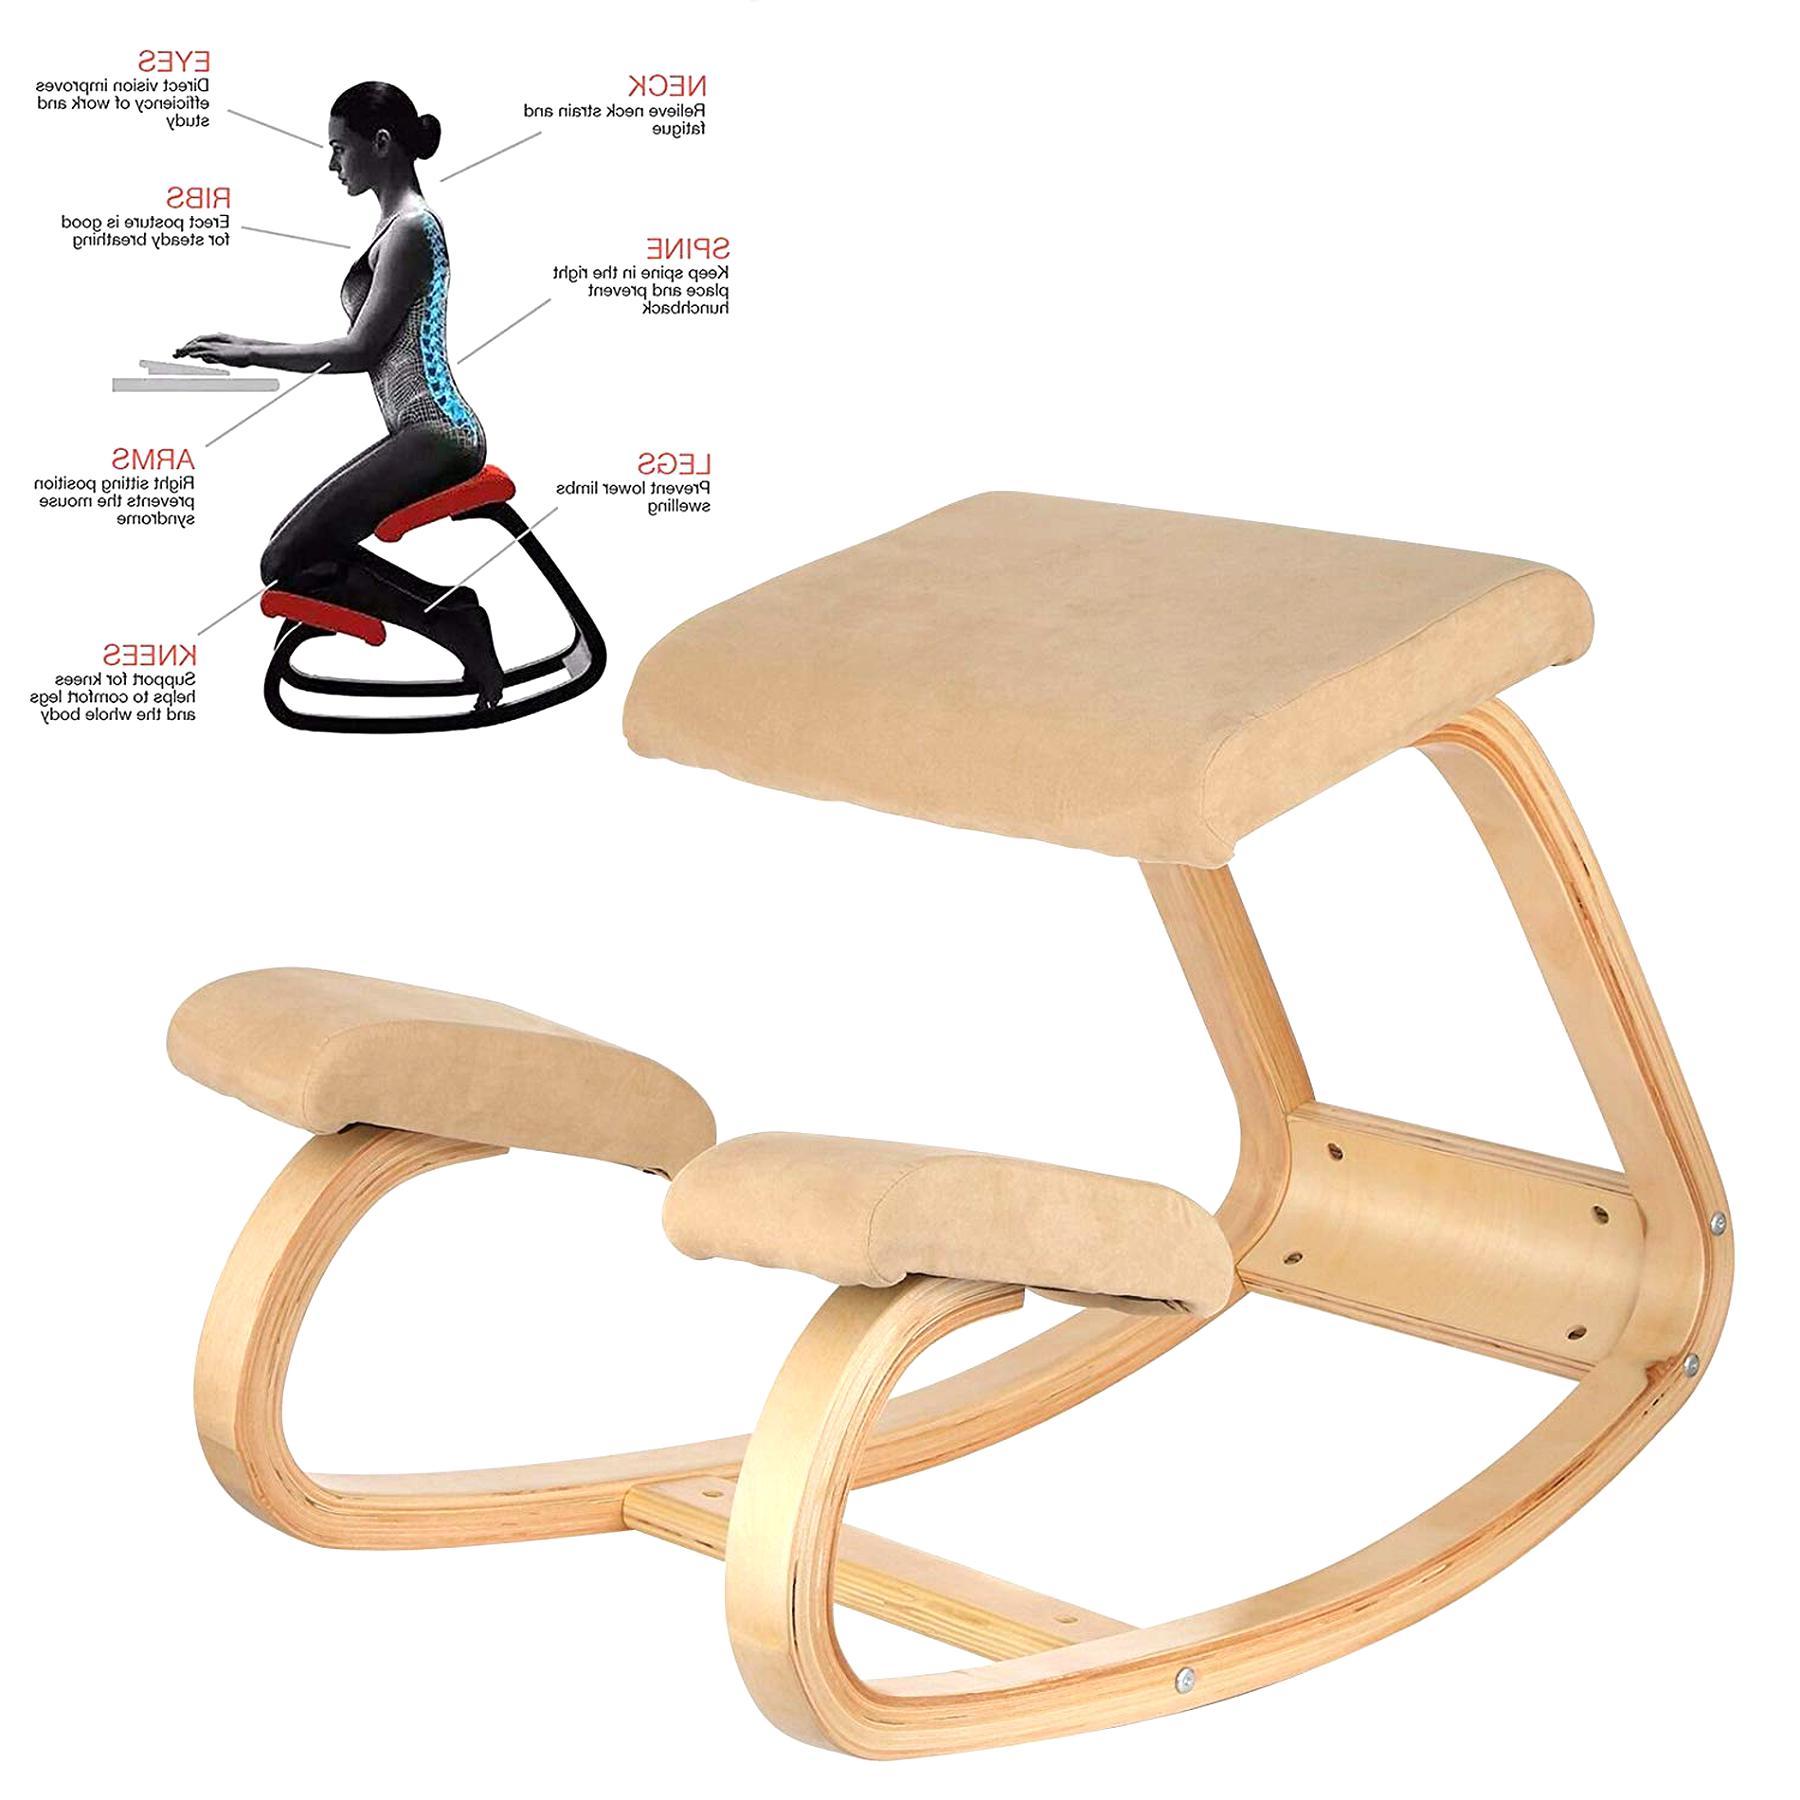 ergonomic chair wood for sale